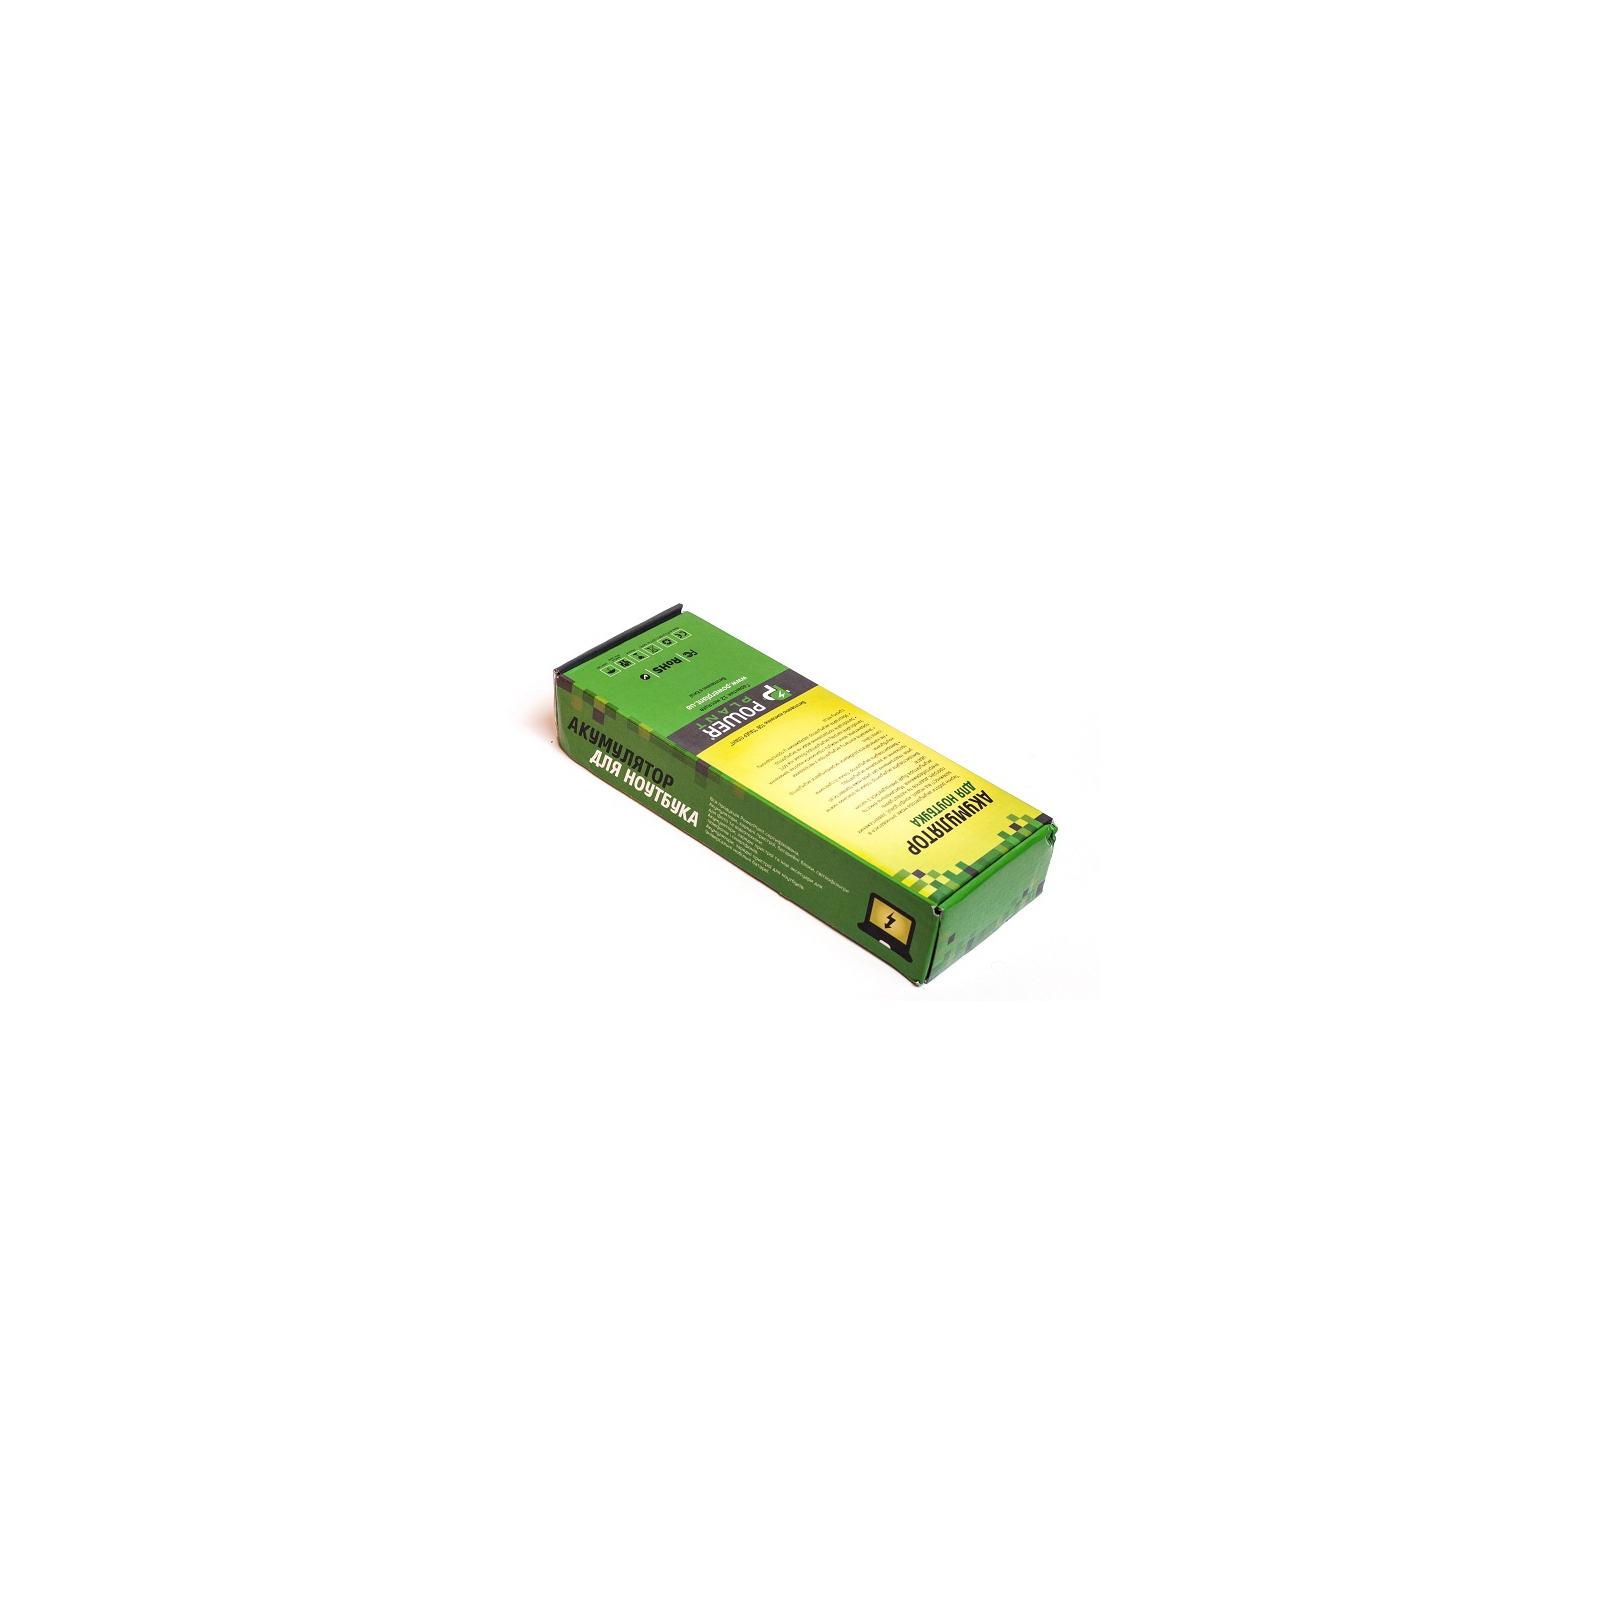 Аккумулятор для ноутбука DELL Studio 1535 (WU946, DE 1537 3S2P) 11.1V 5200mAh PowerPlant (NB00000051) изображение 2